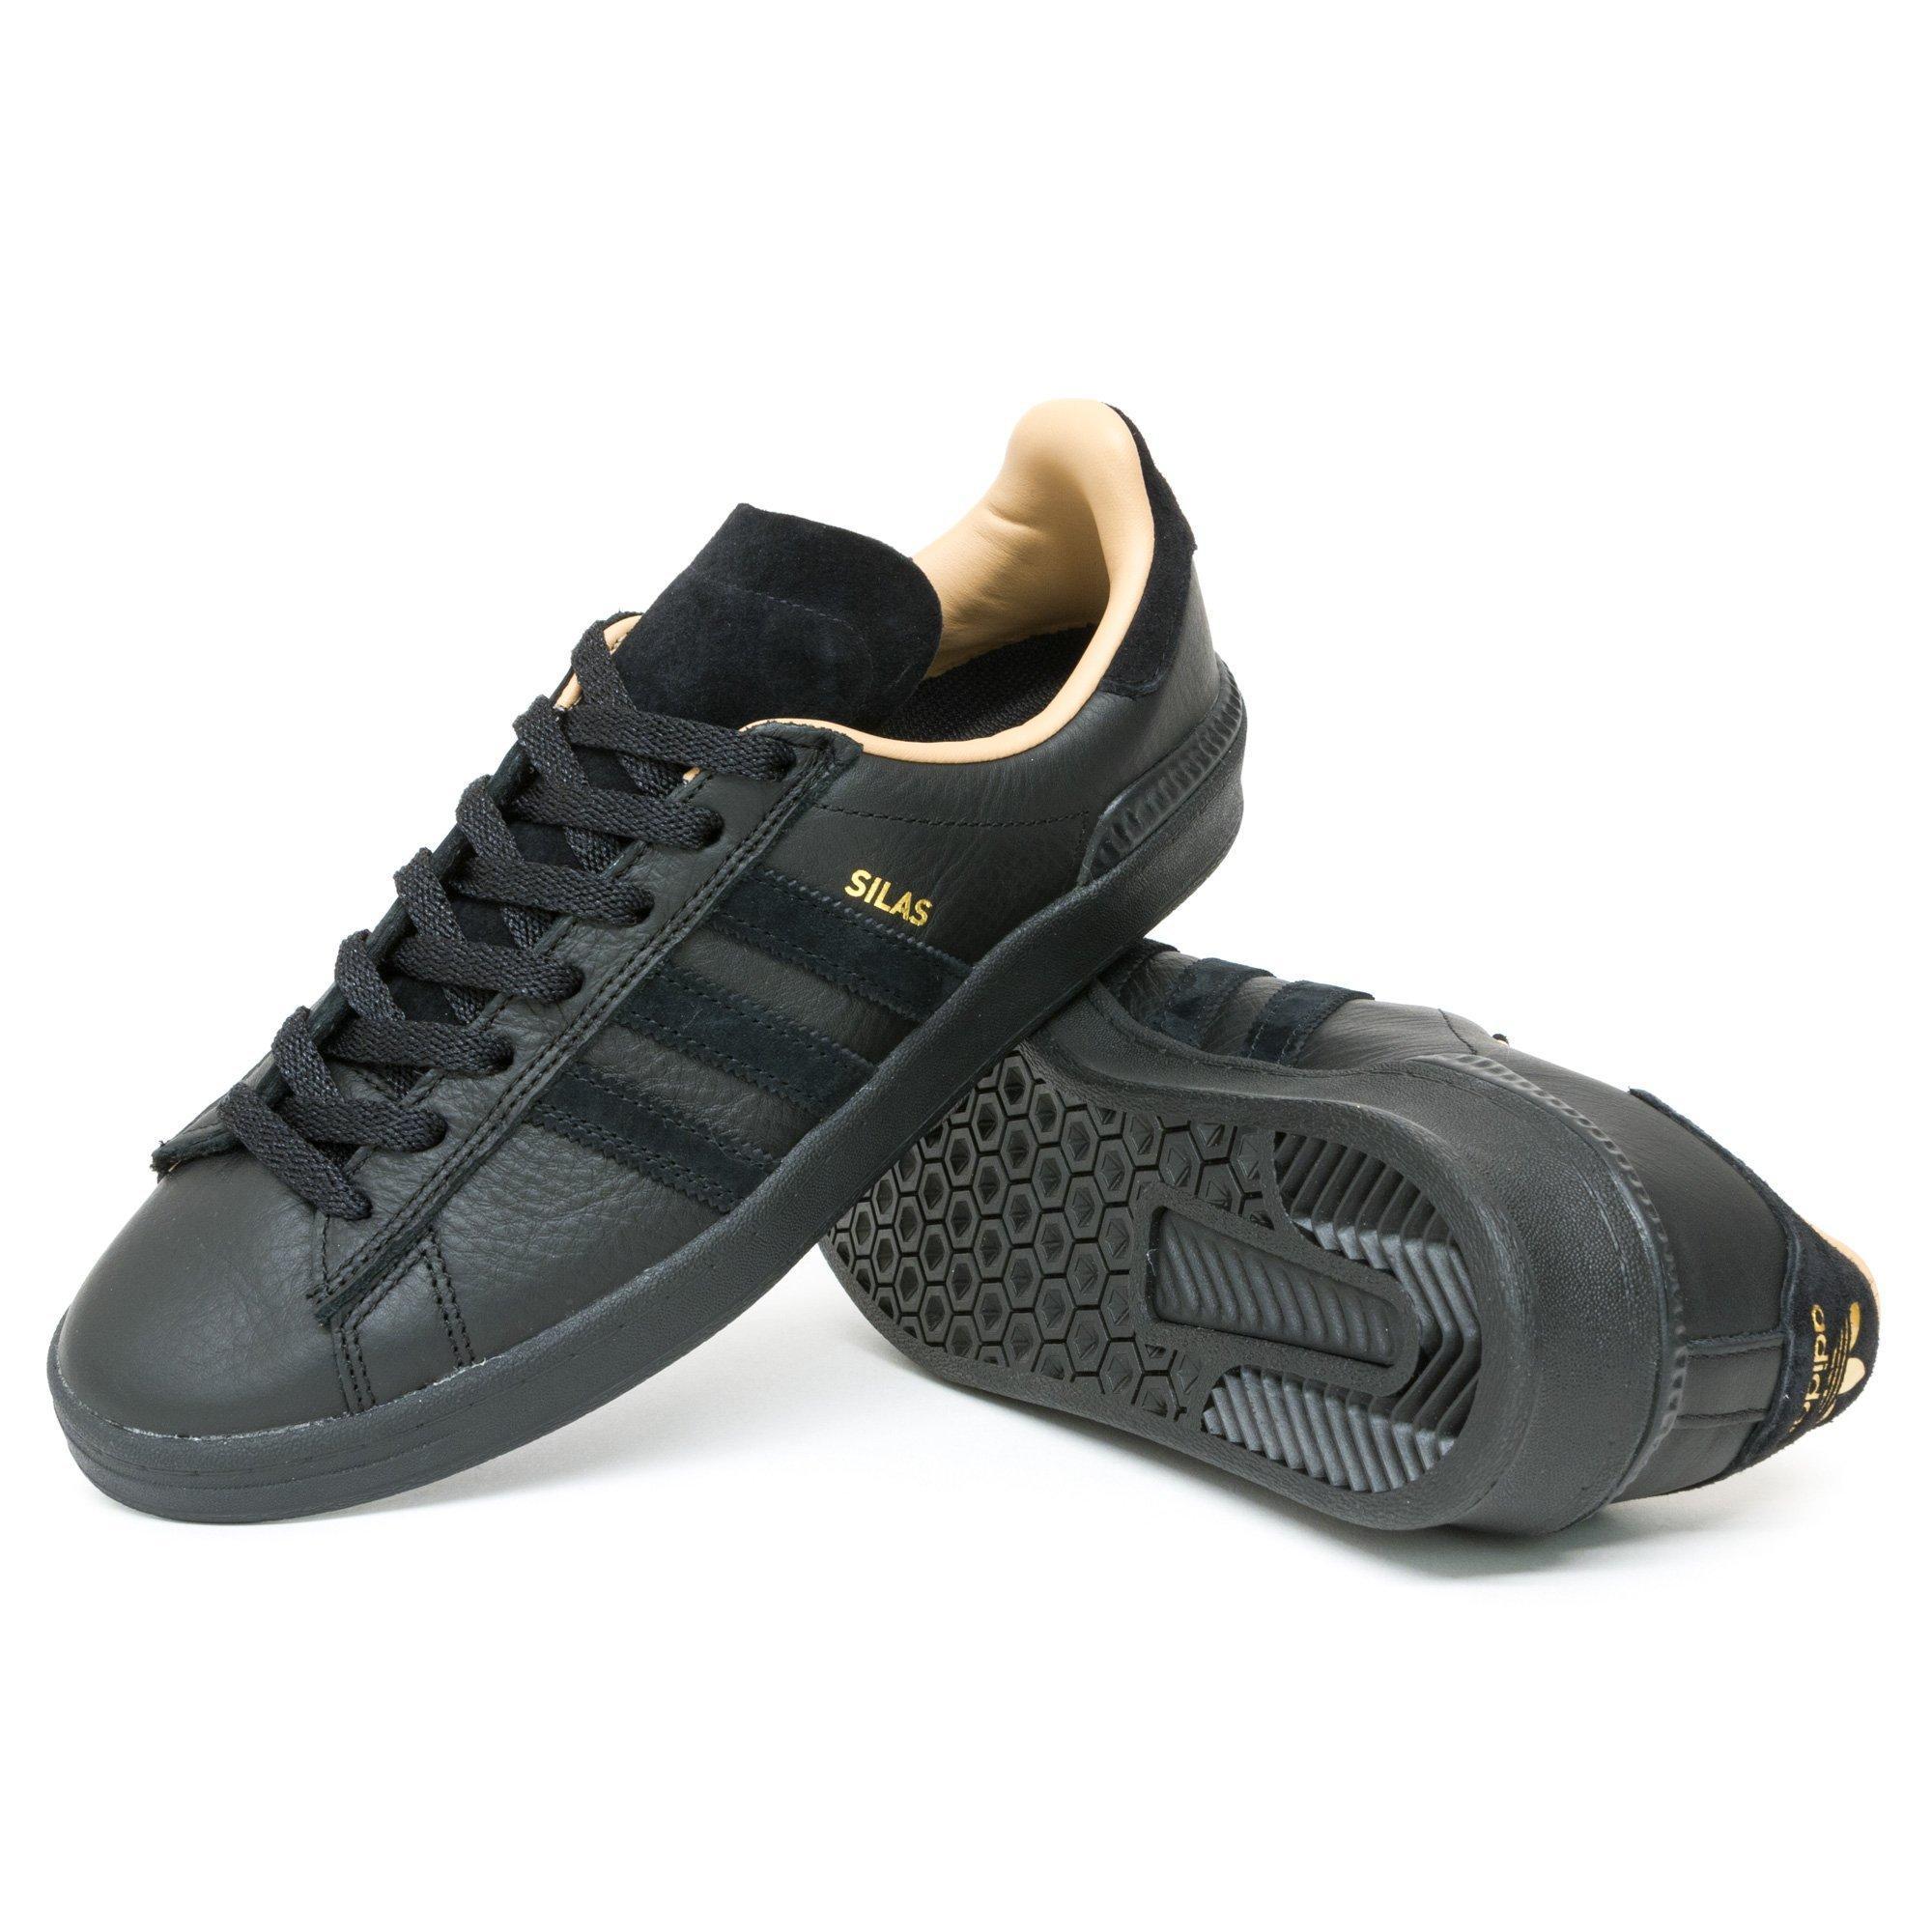 adidas campus 2 | Adidas sneakers, Adidas campus, Adidas